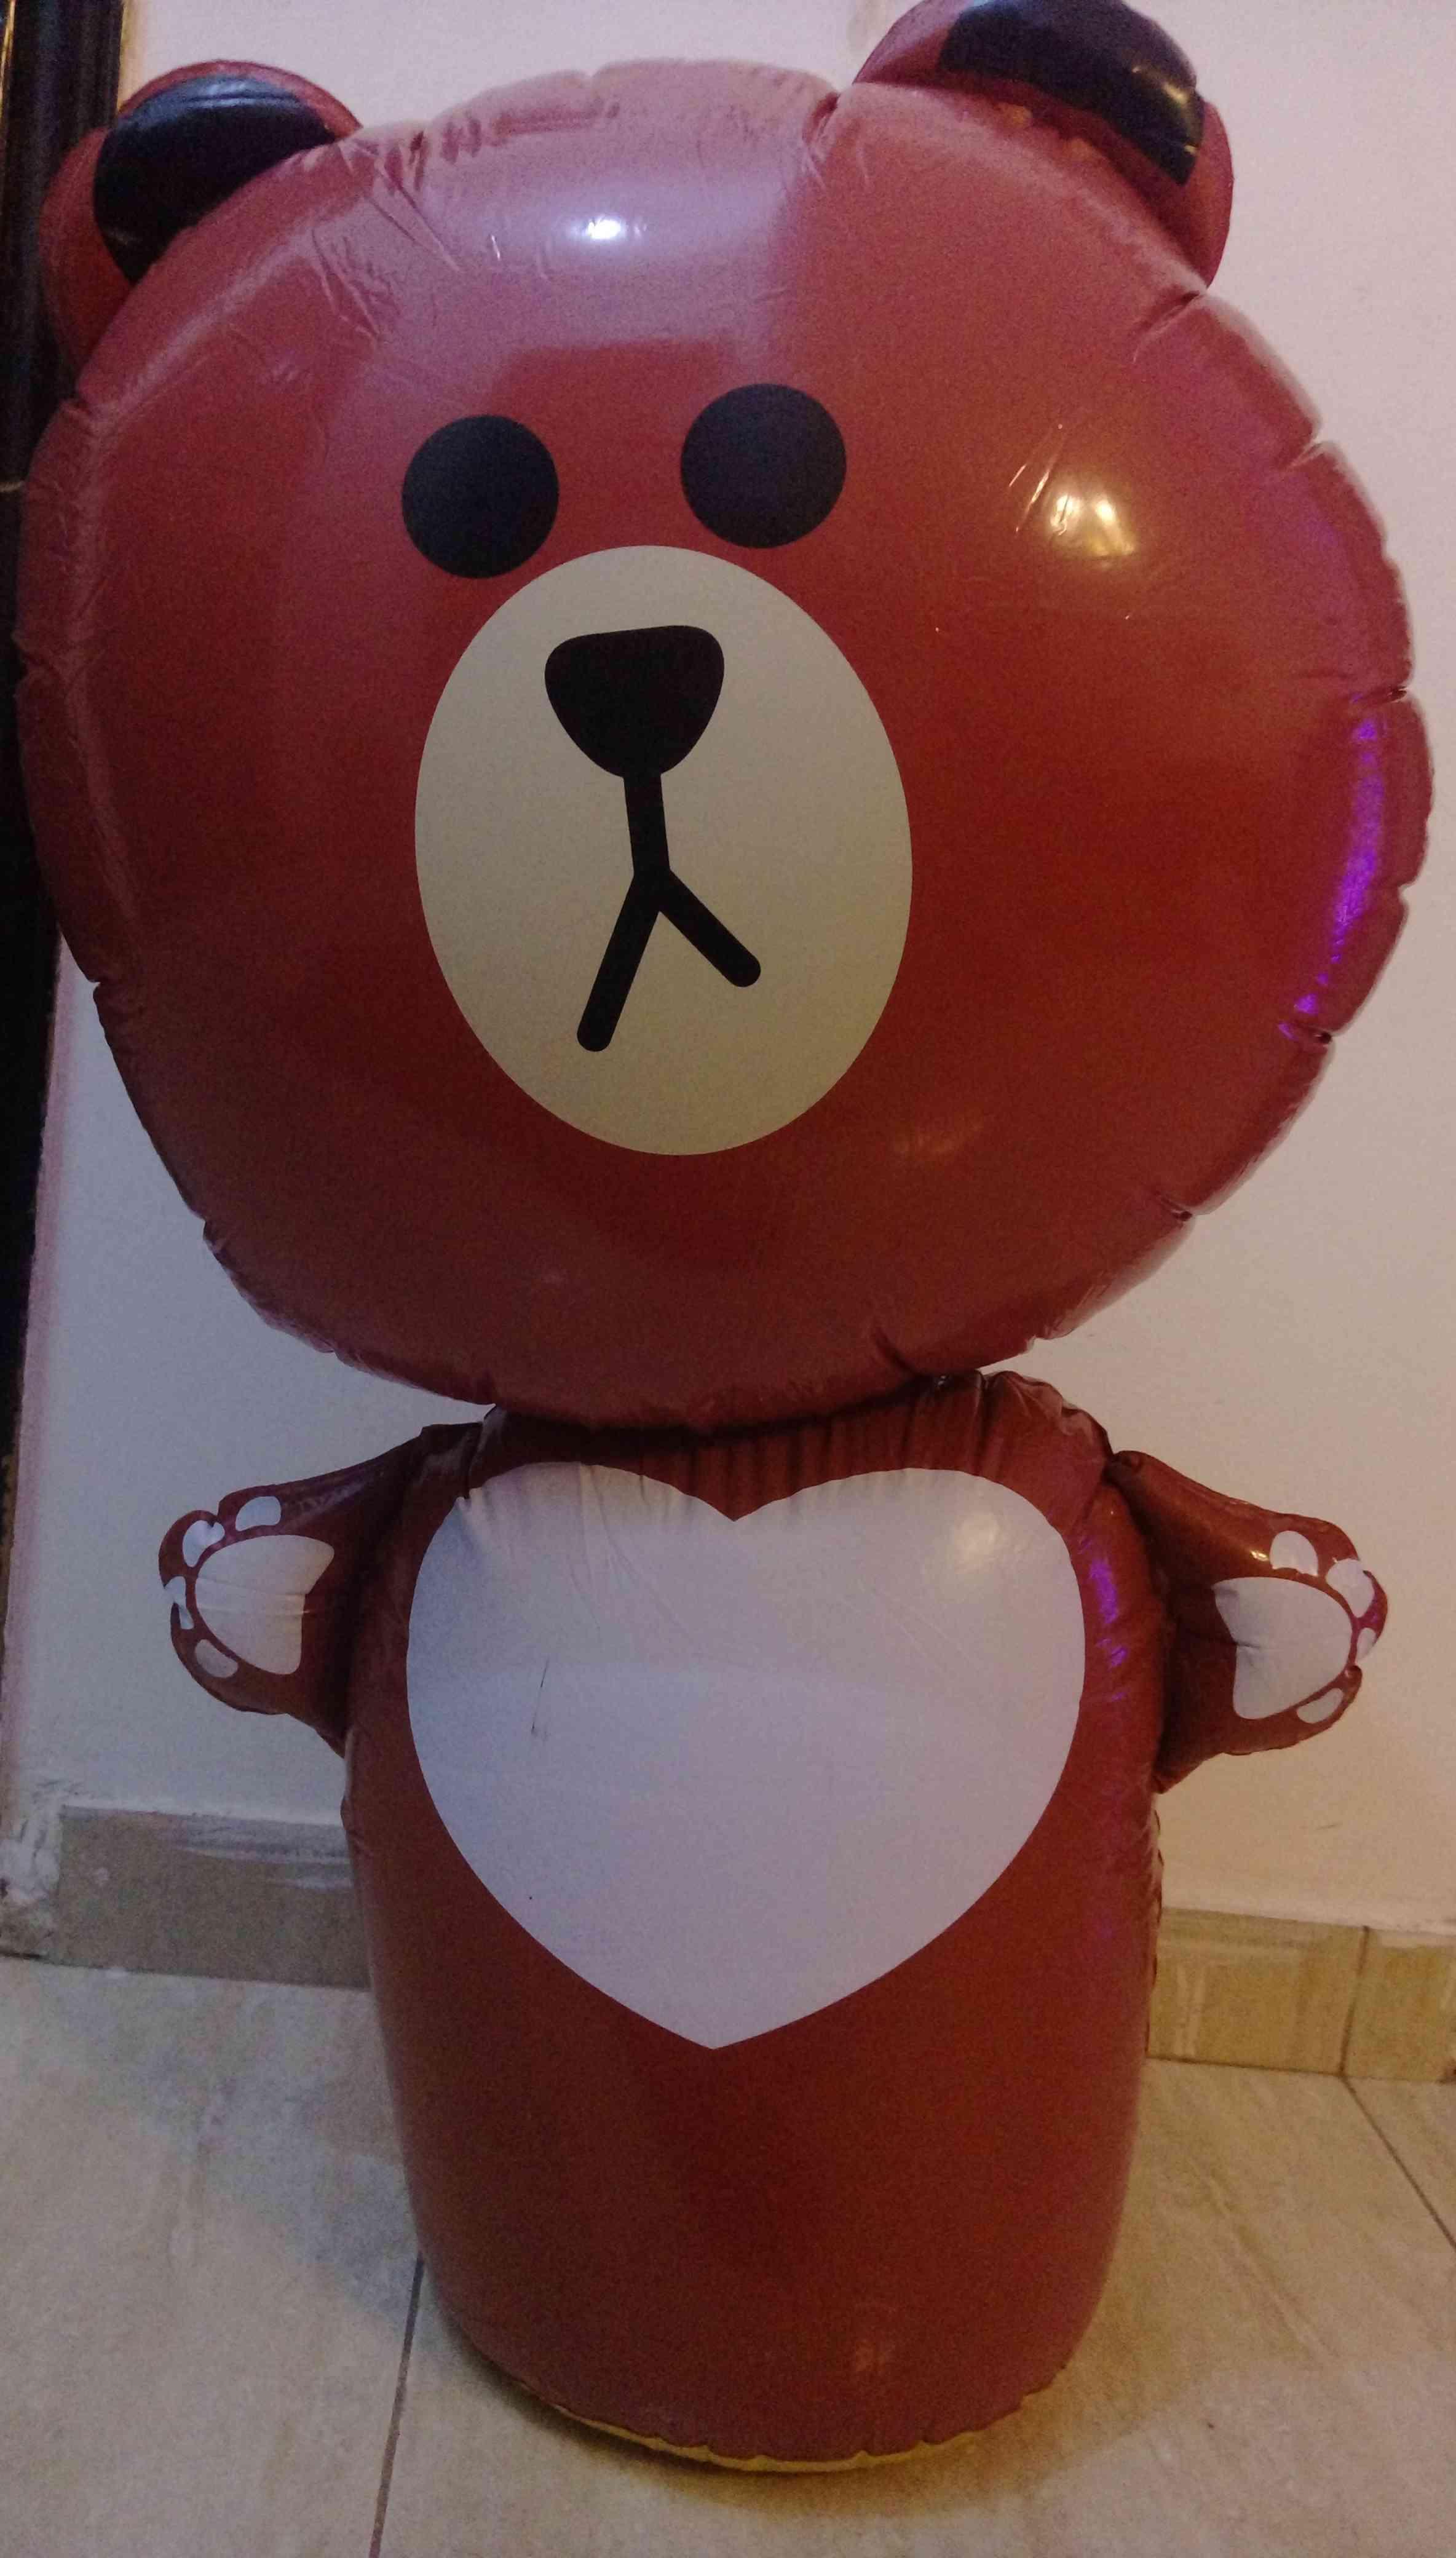 Toys for kids-  بالون المصارع مع طفلك...